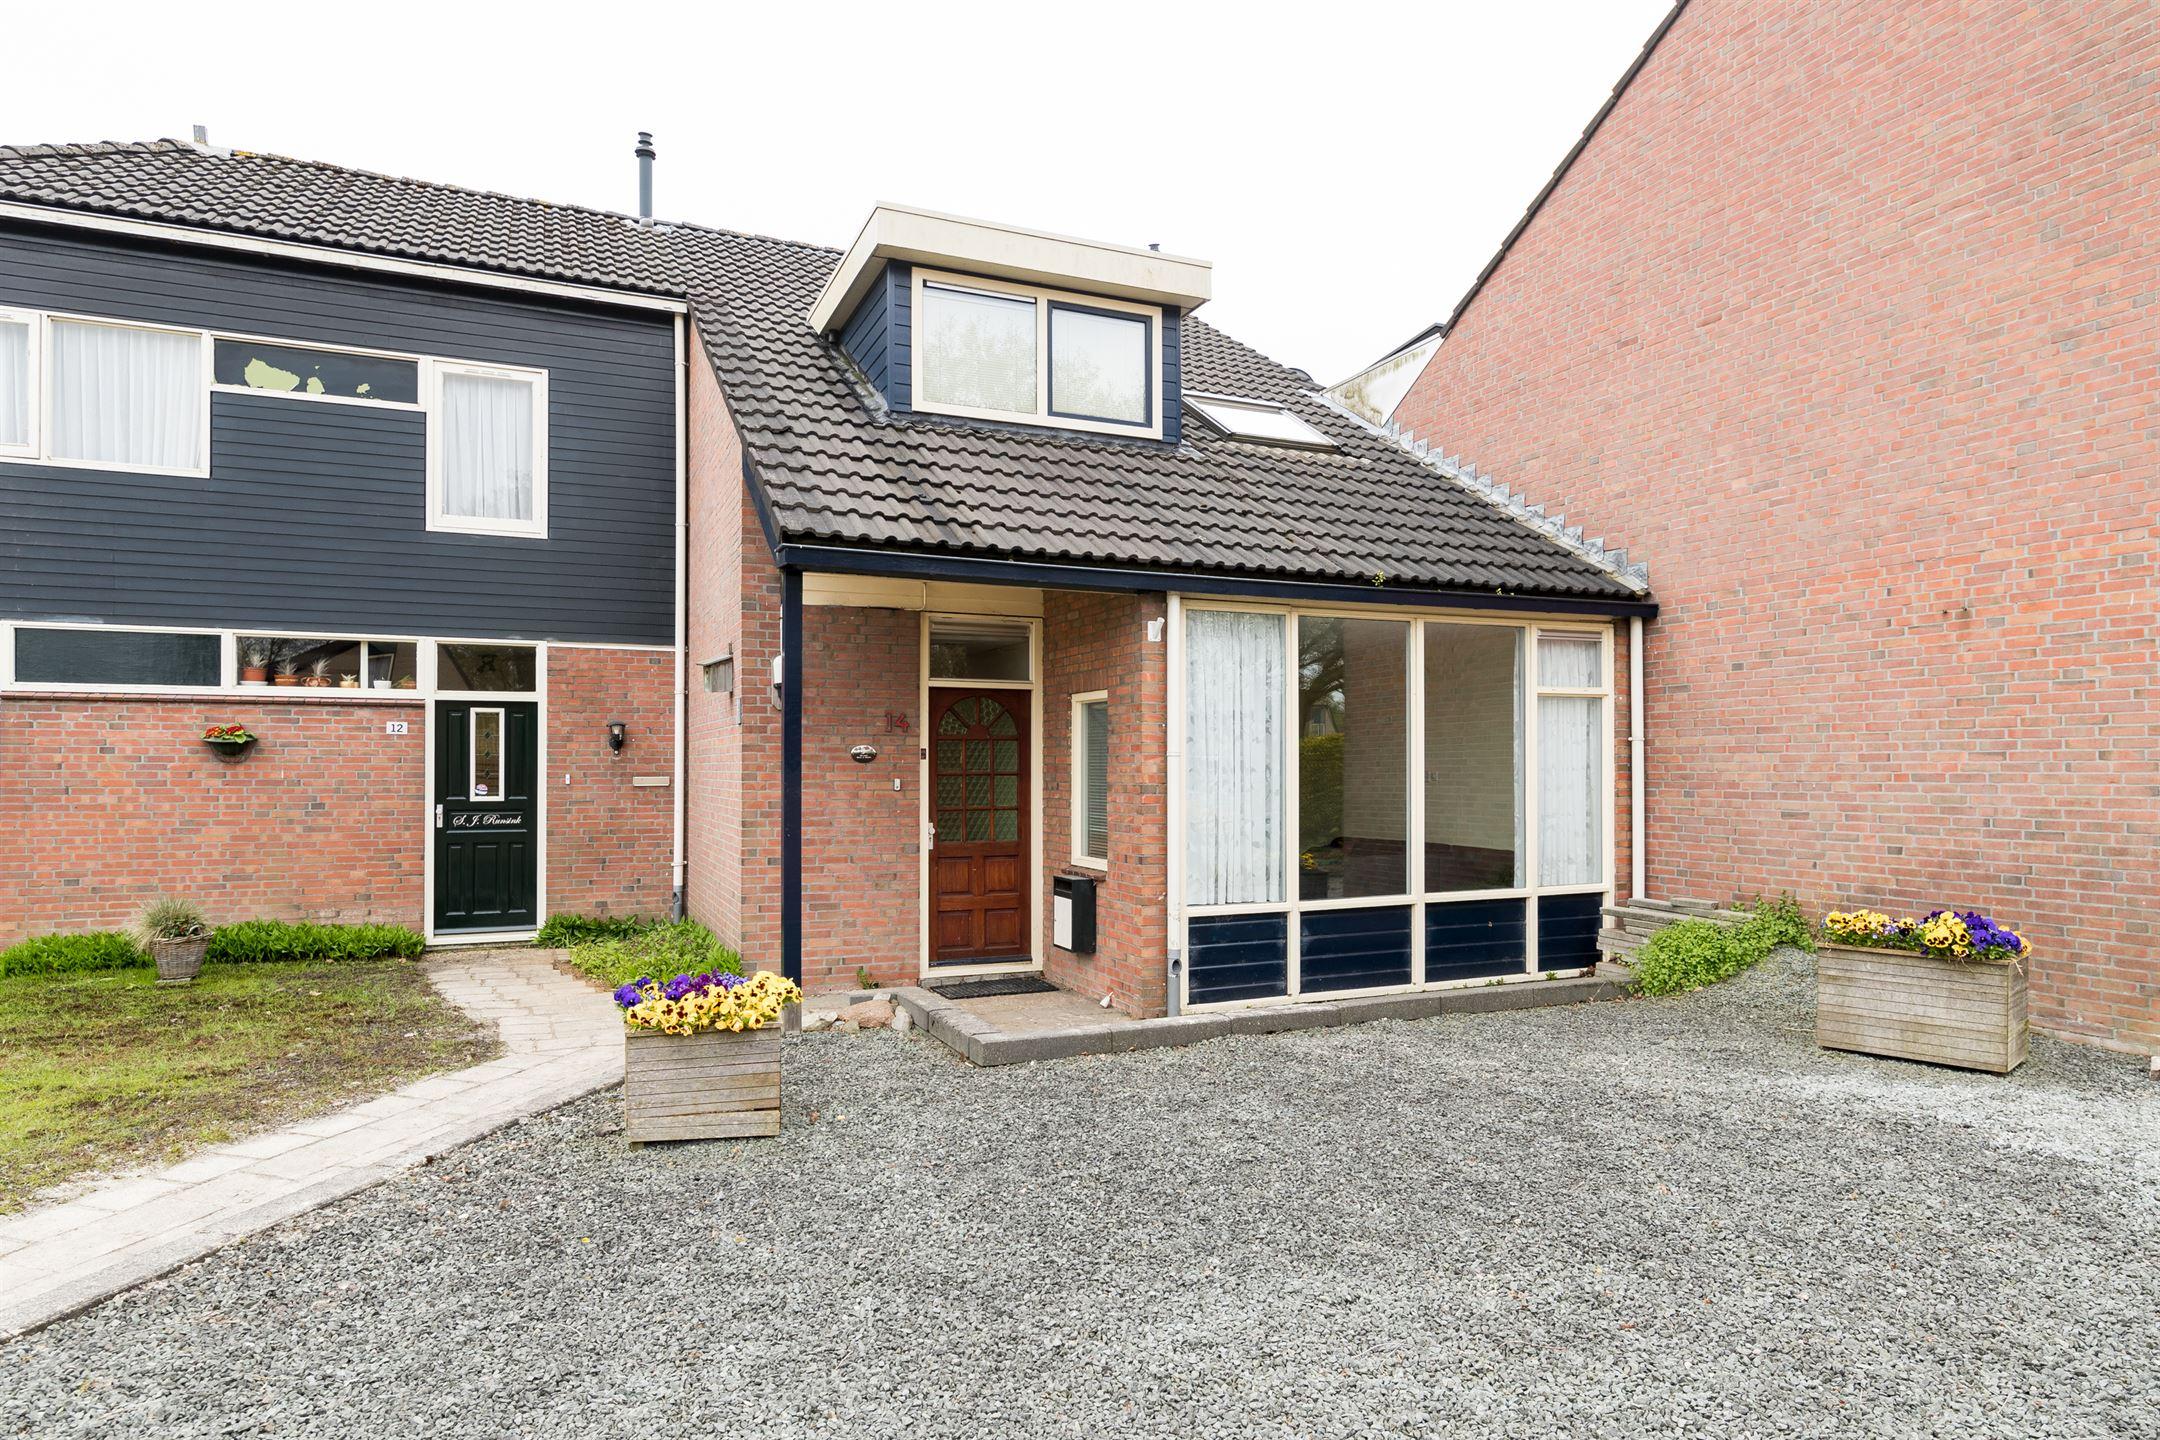 Verkocht den dam 14 9301 xg roden funda - Eigentijdse huisfotos ...